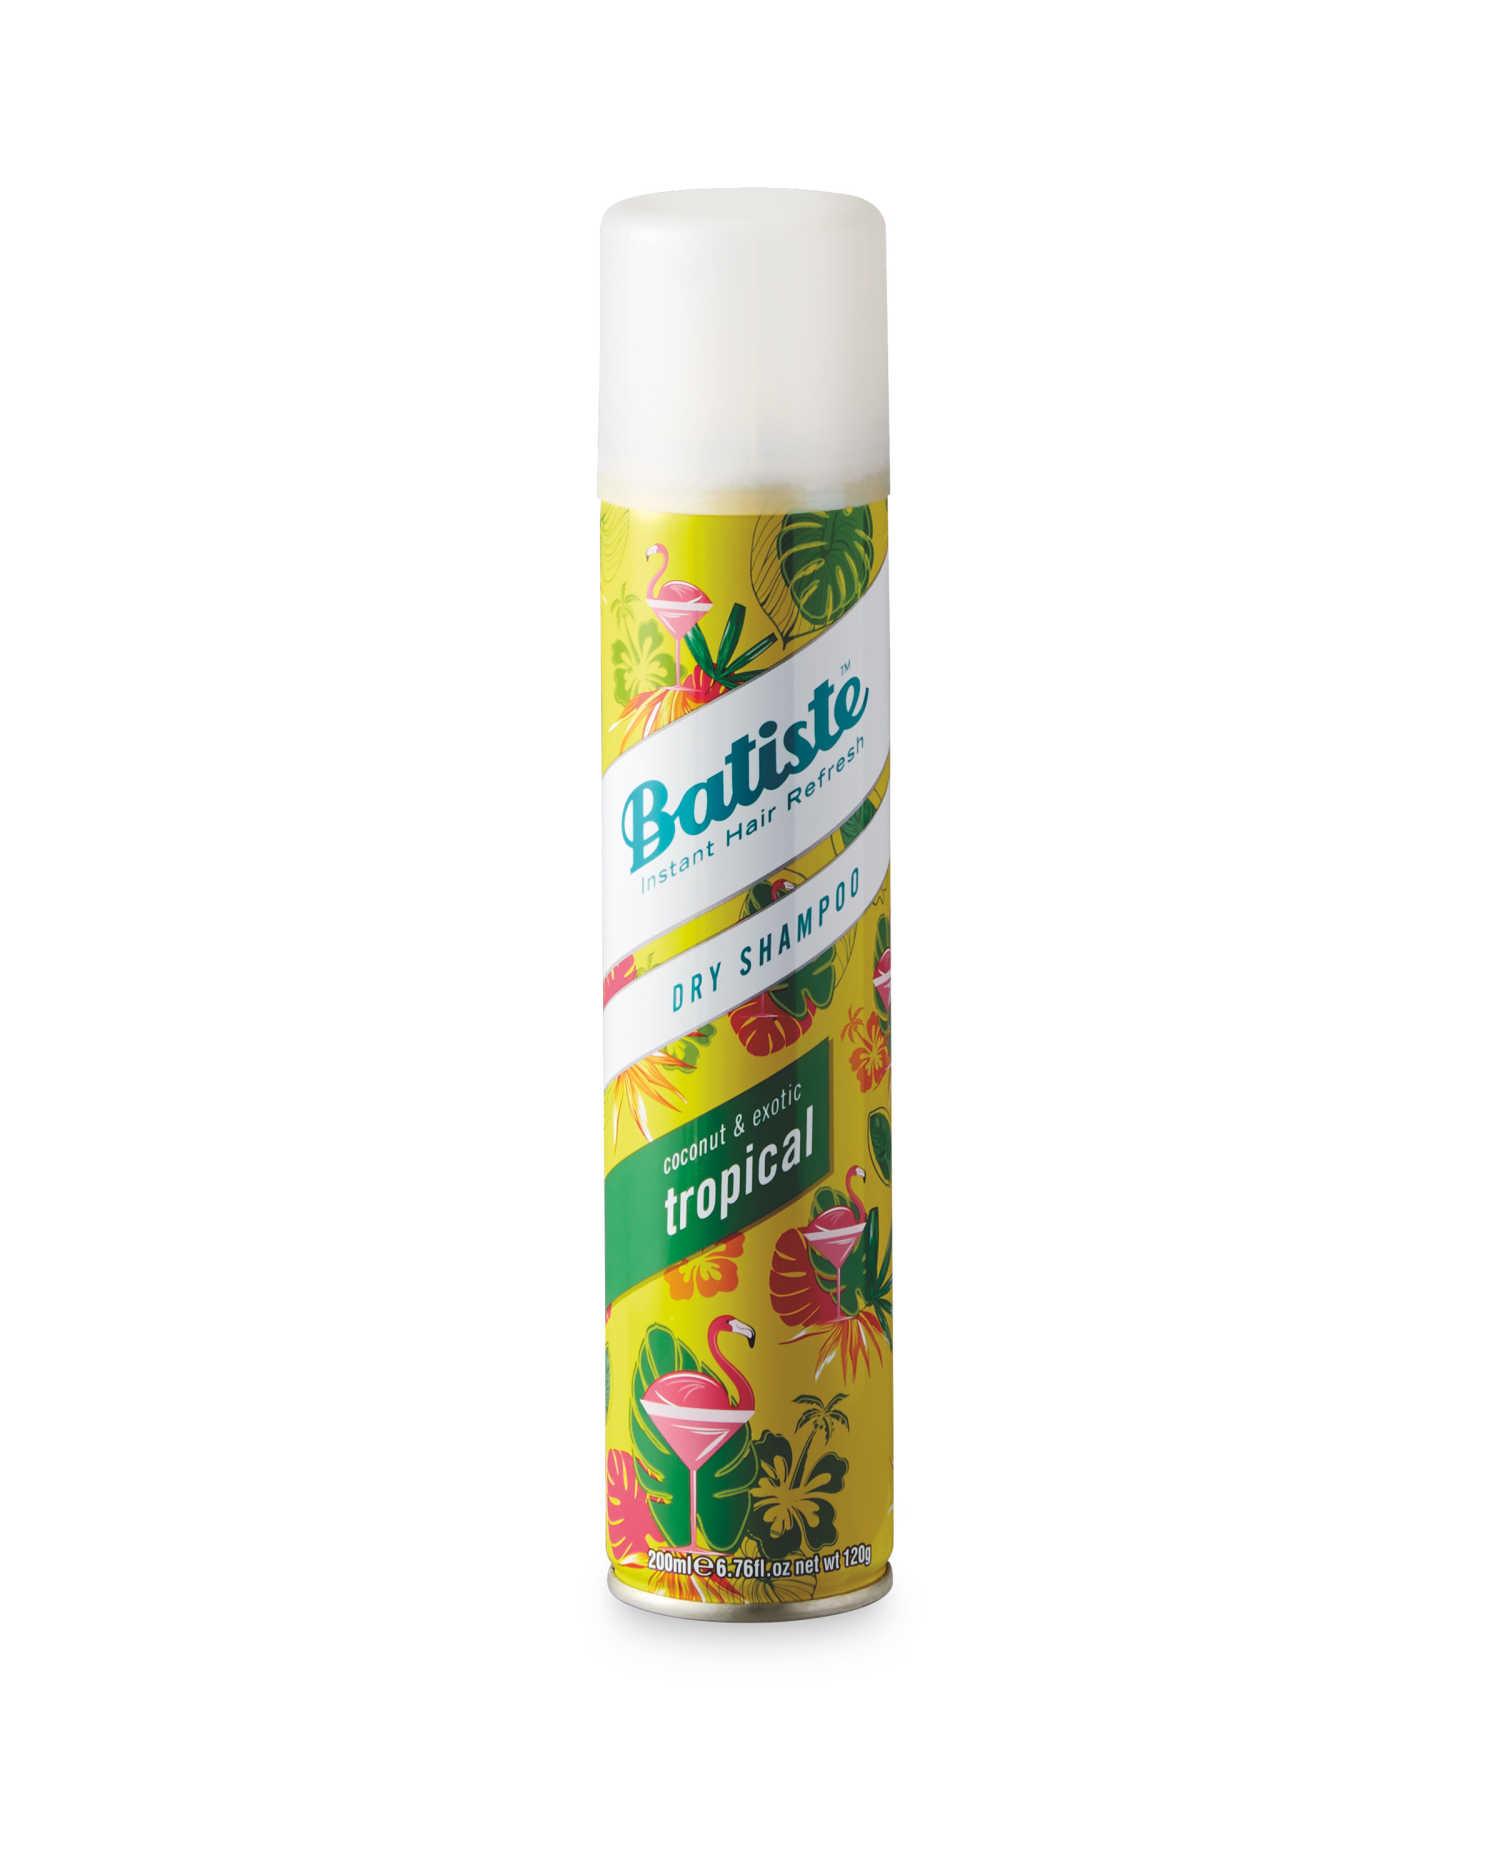 Batiste Tropical Dry Shampoo 200ml imagine produs